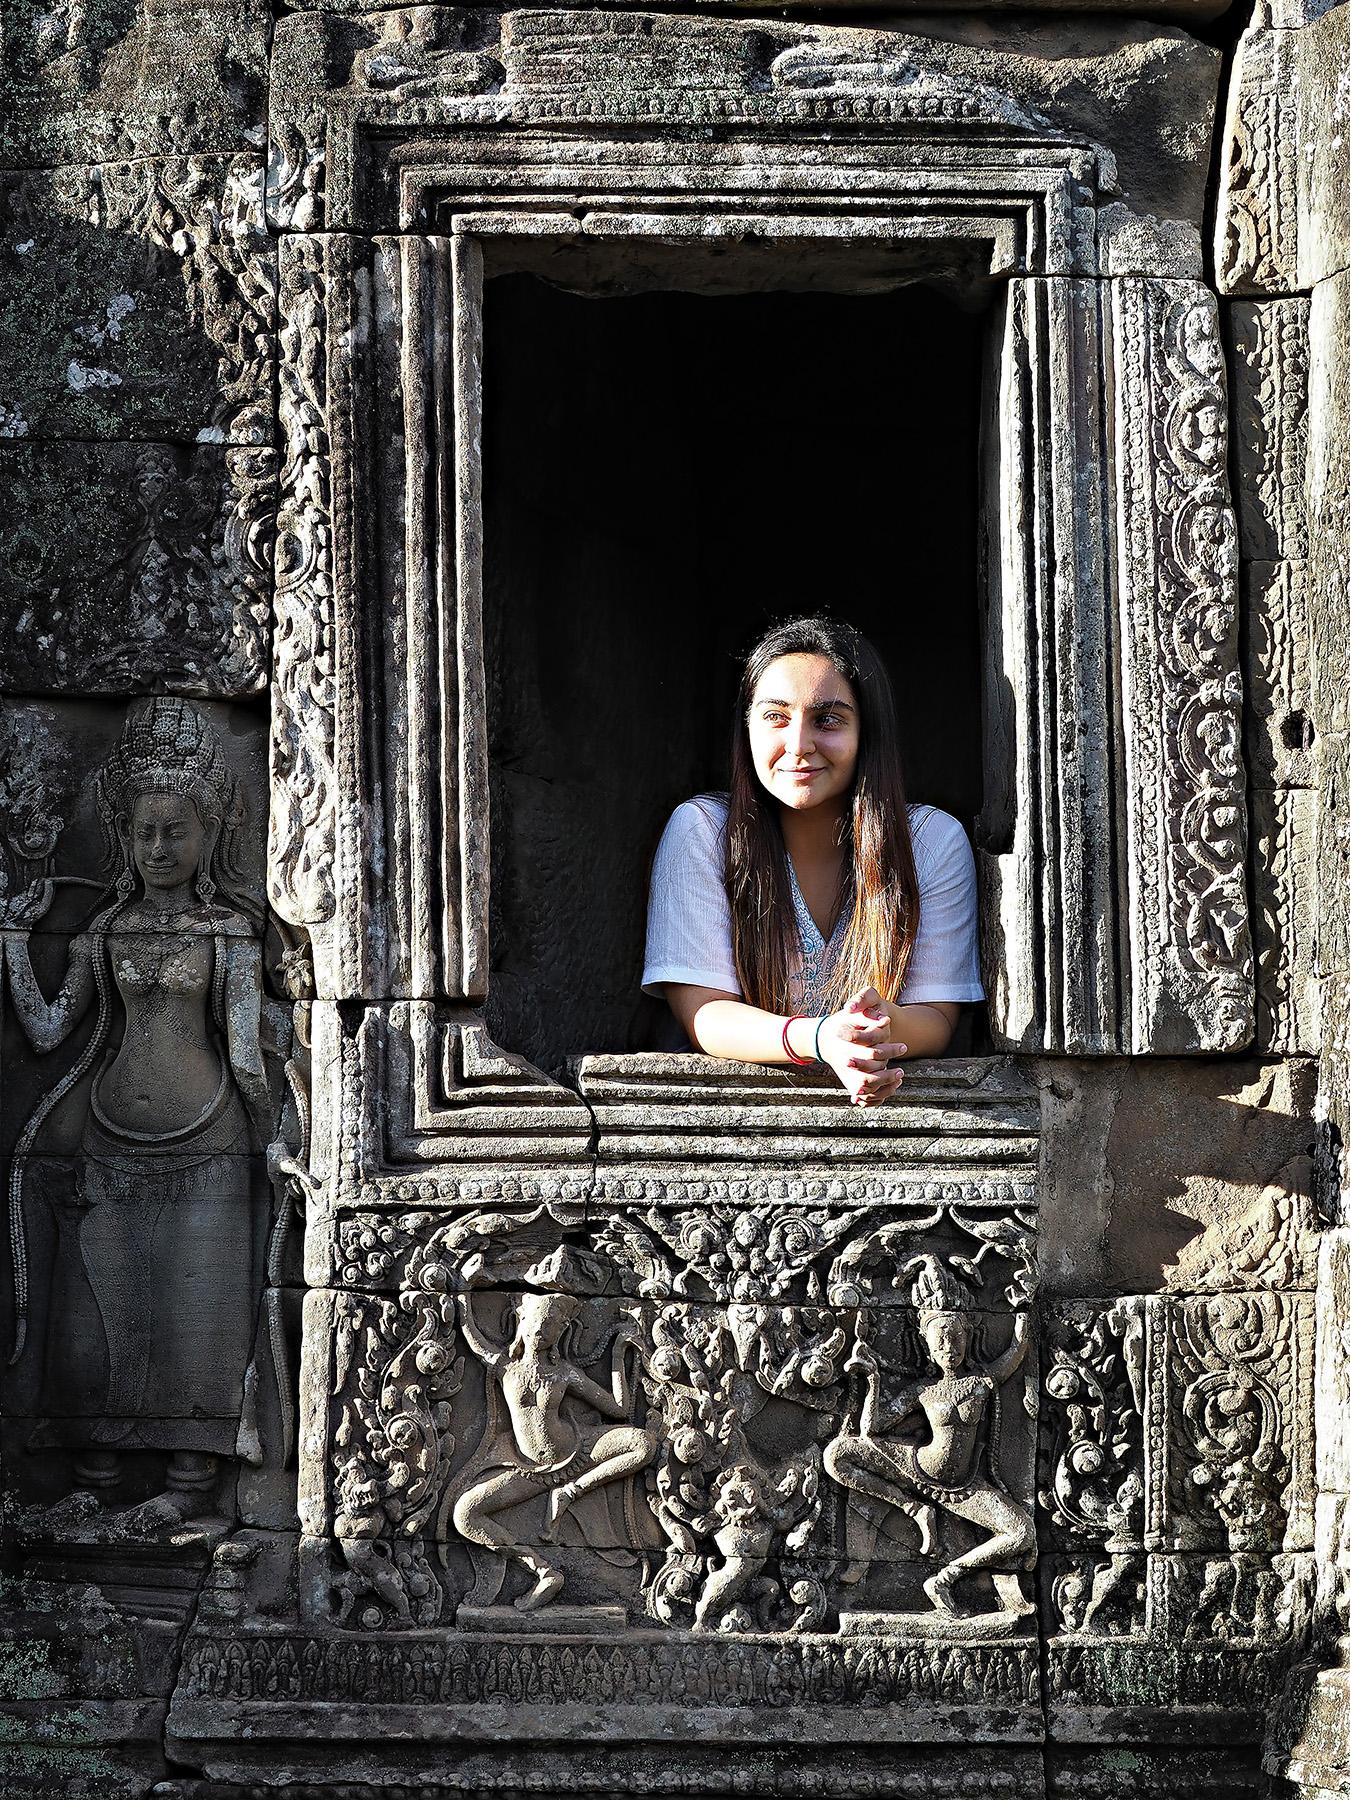 Ranjan_Ramchandani_A portrait in Cambodia.jpg